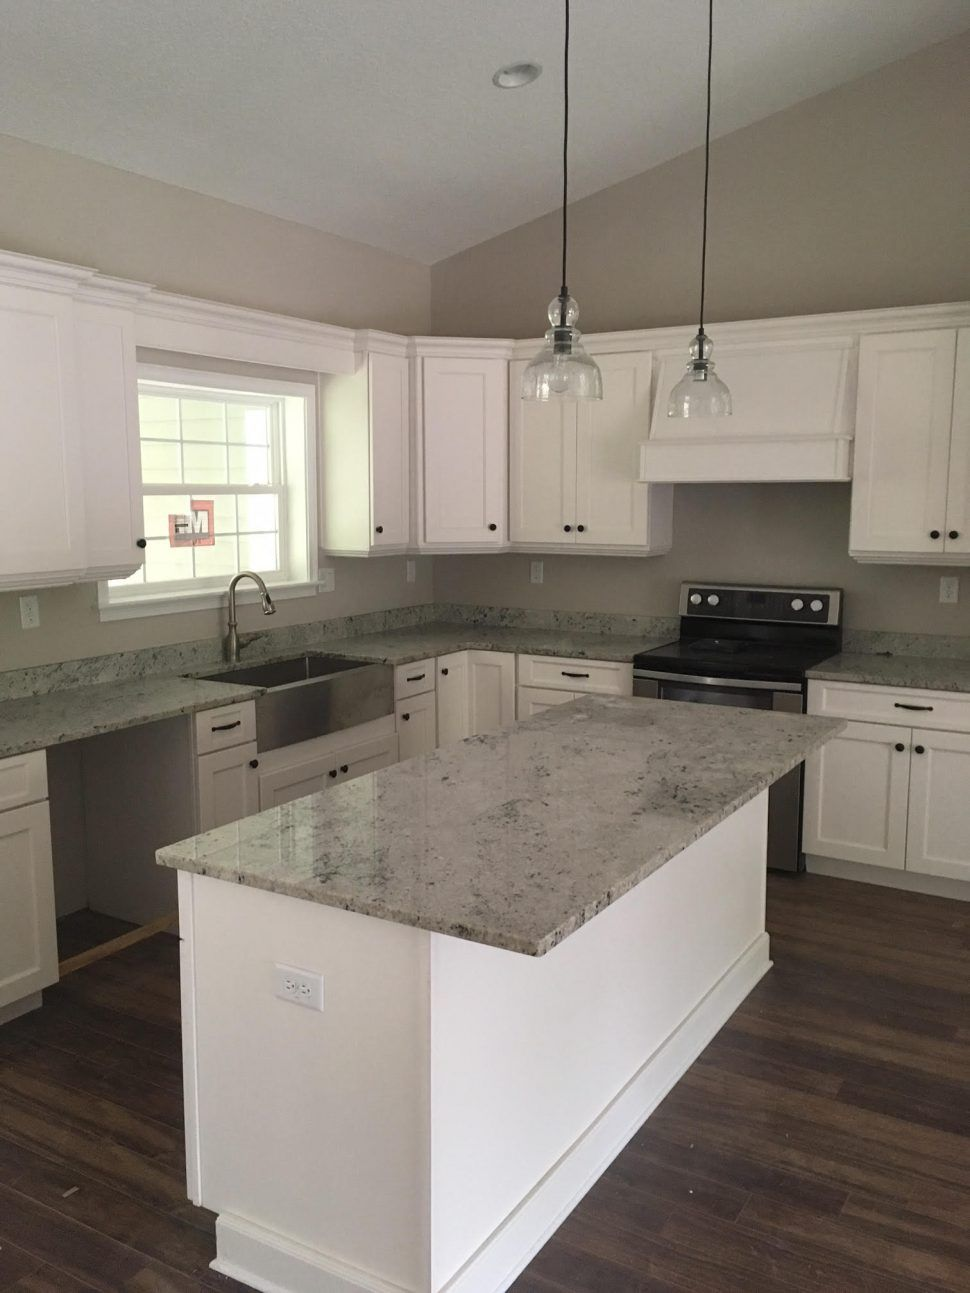 Merveilleux 50+ Quartz Countertops Houston   Kitchen Cabinets Storage Ideas Check More  At Http:/